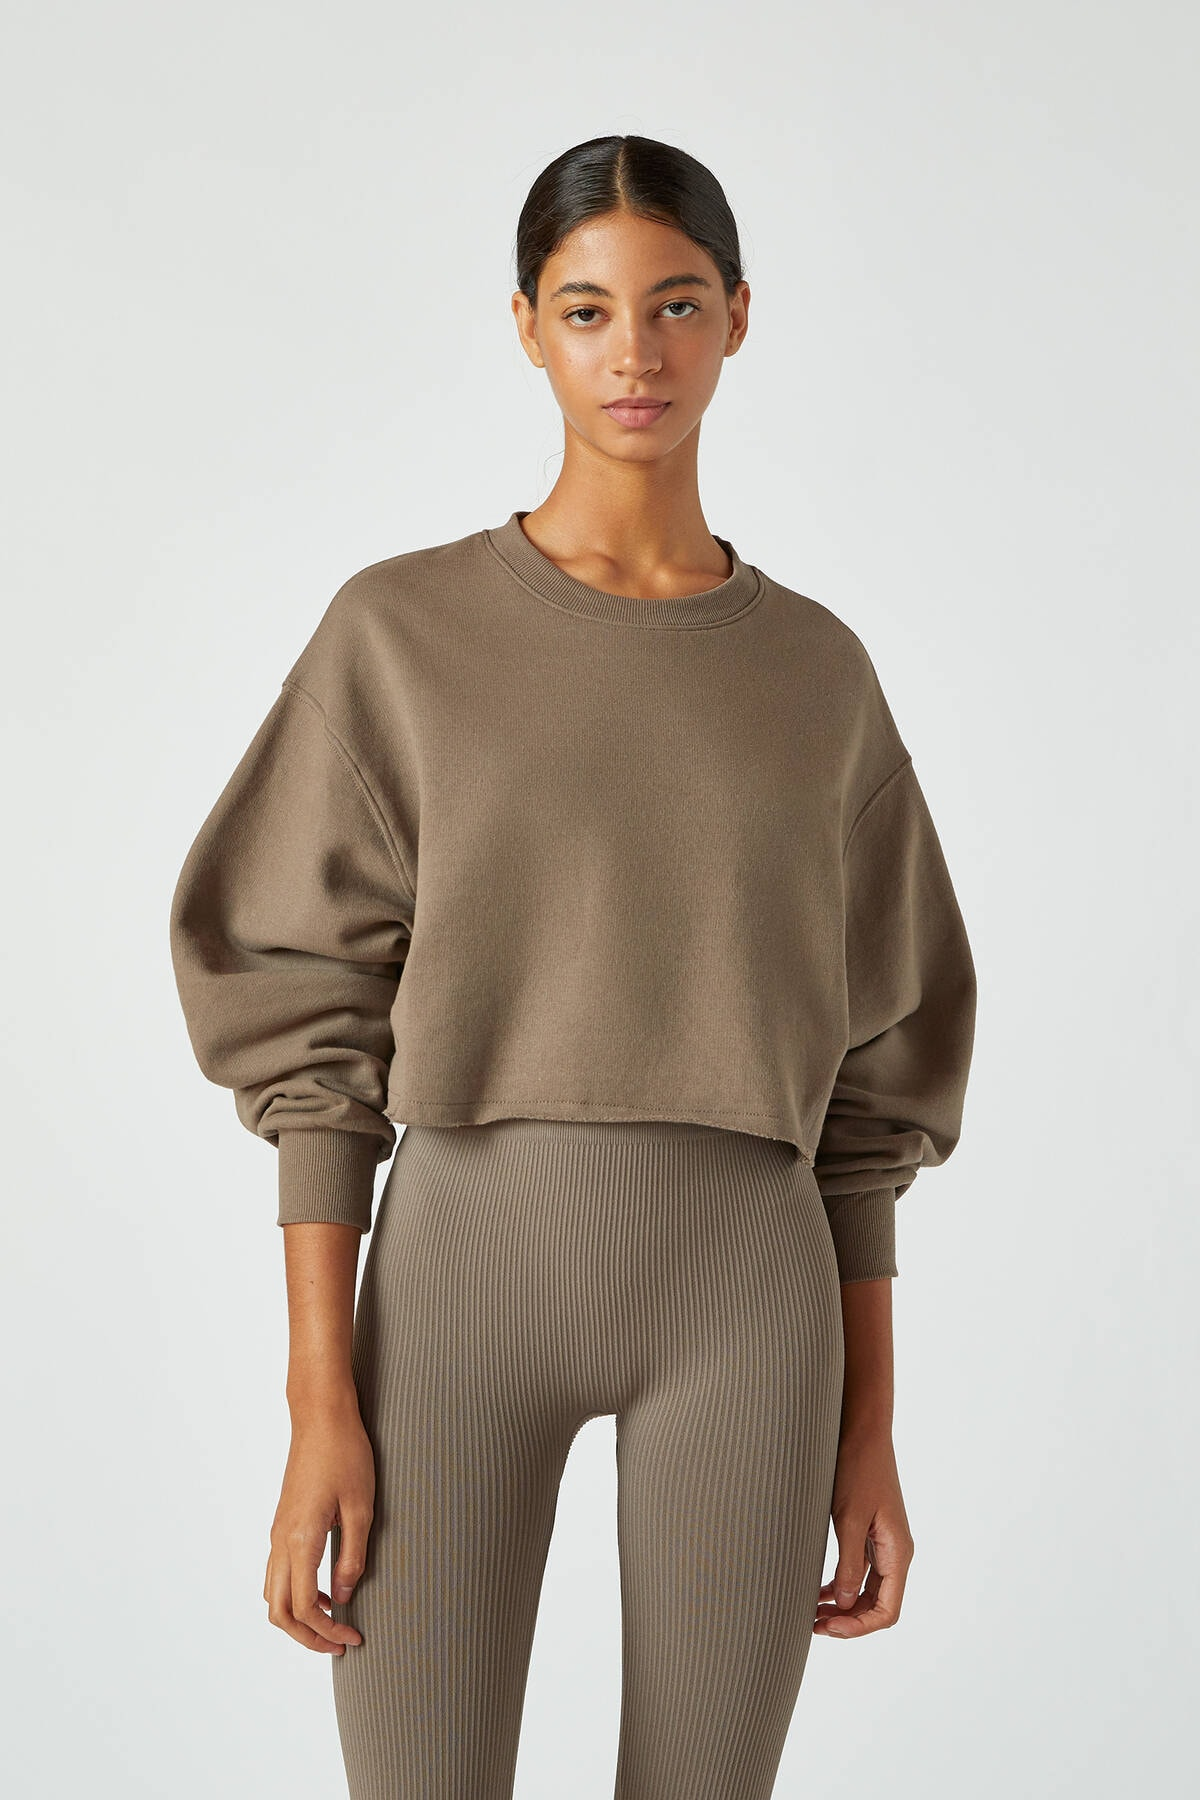 Pull & Bear Kadın Boz Gri Rahat Crop Fit Sweatshirt 09594315 0